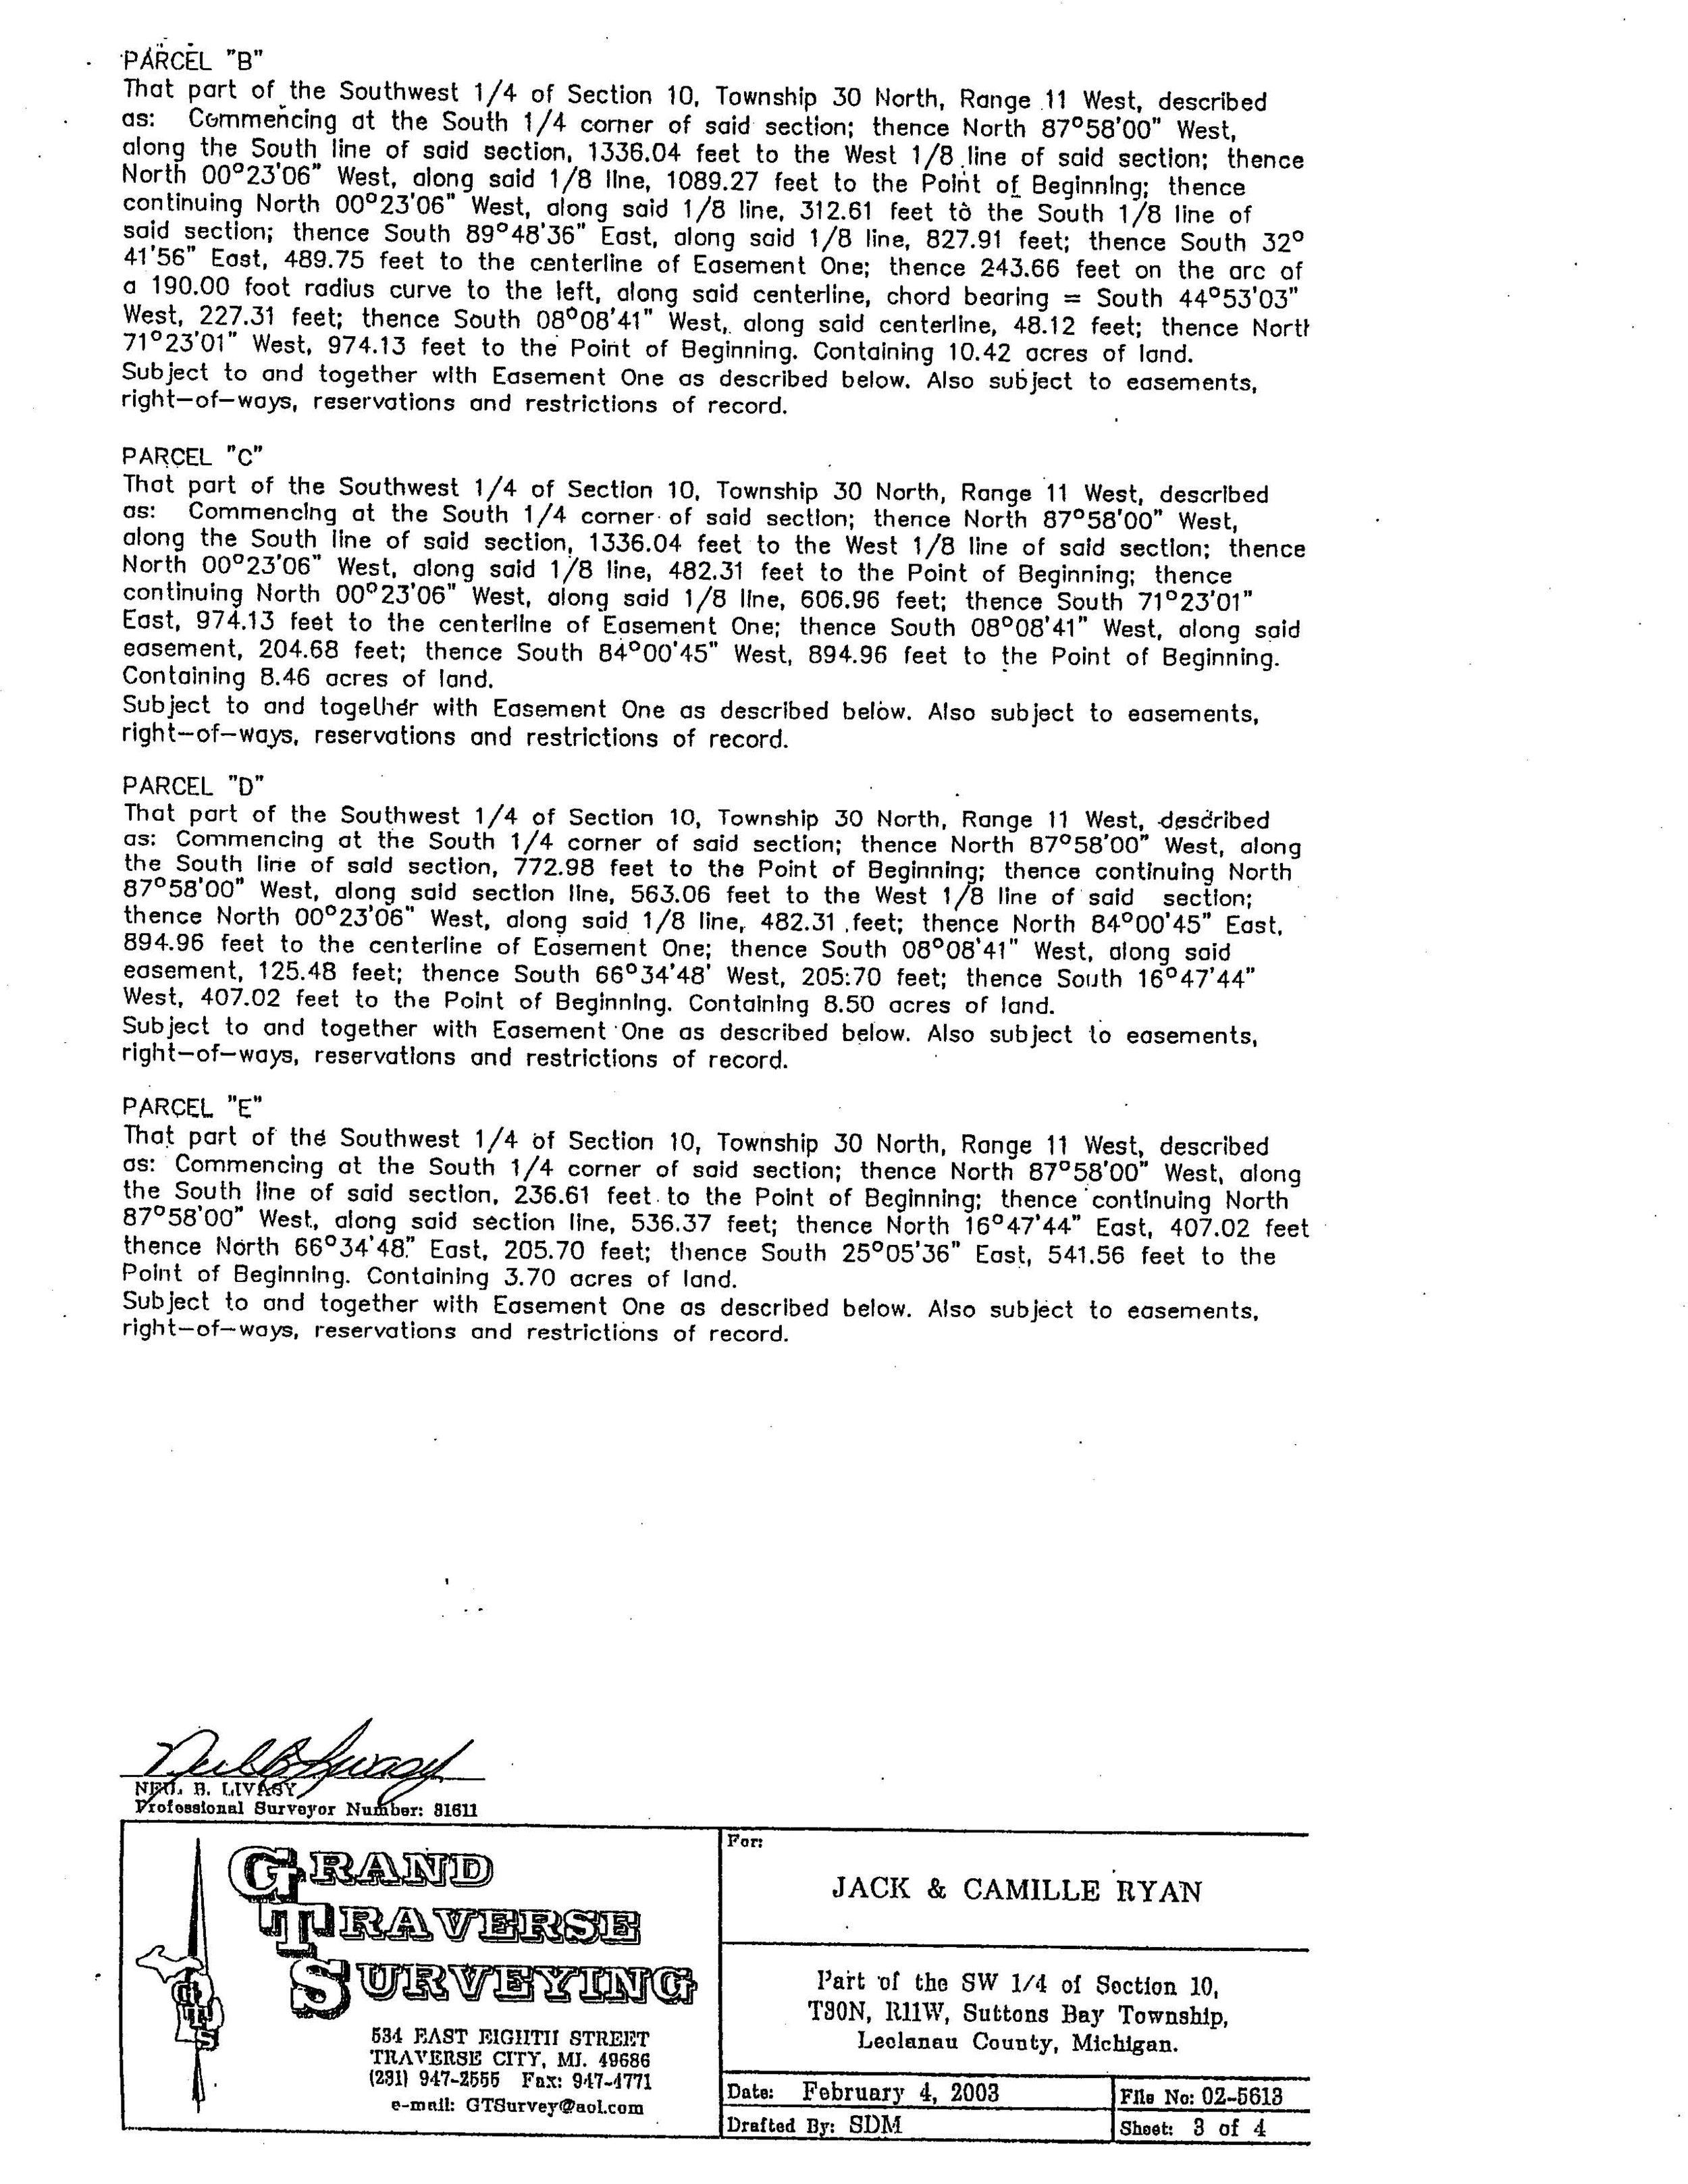 11635 E Belanger Woods Dr Marketing Packet - For Sale by Oltersdorf Realty LLC (13).jpg